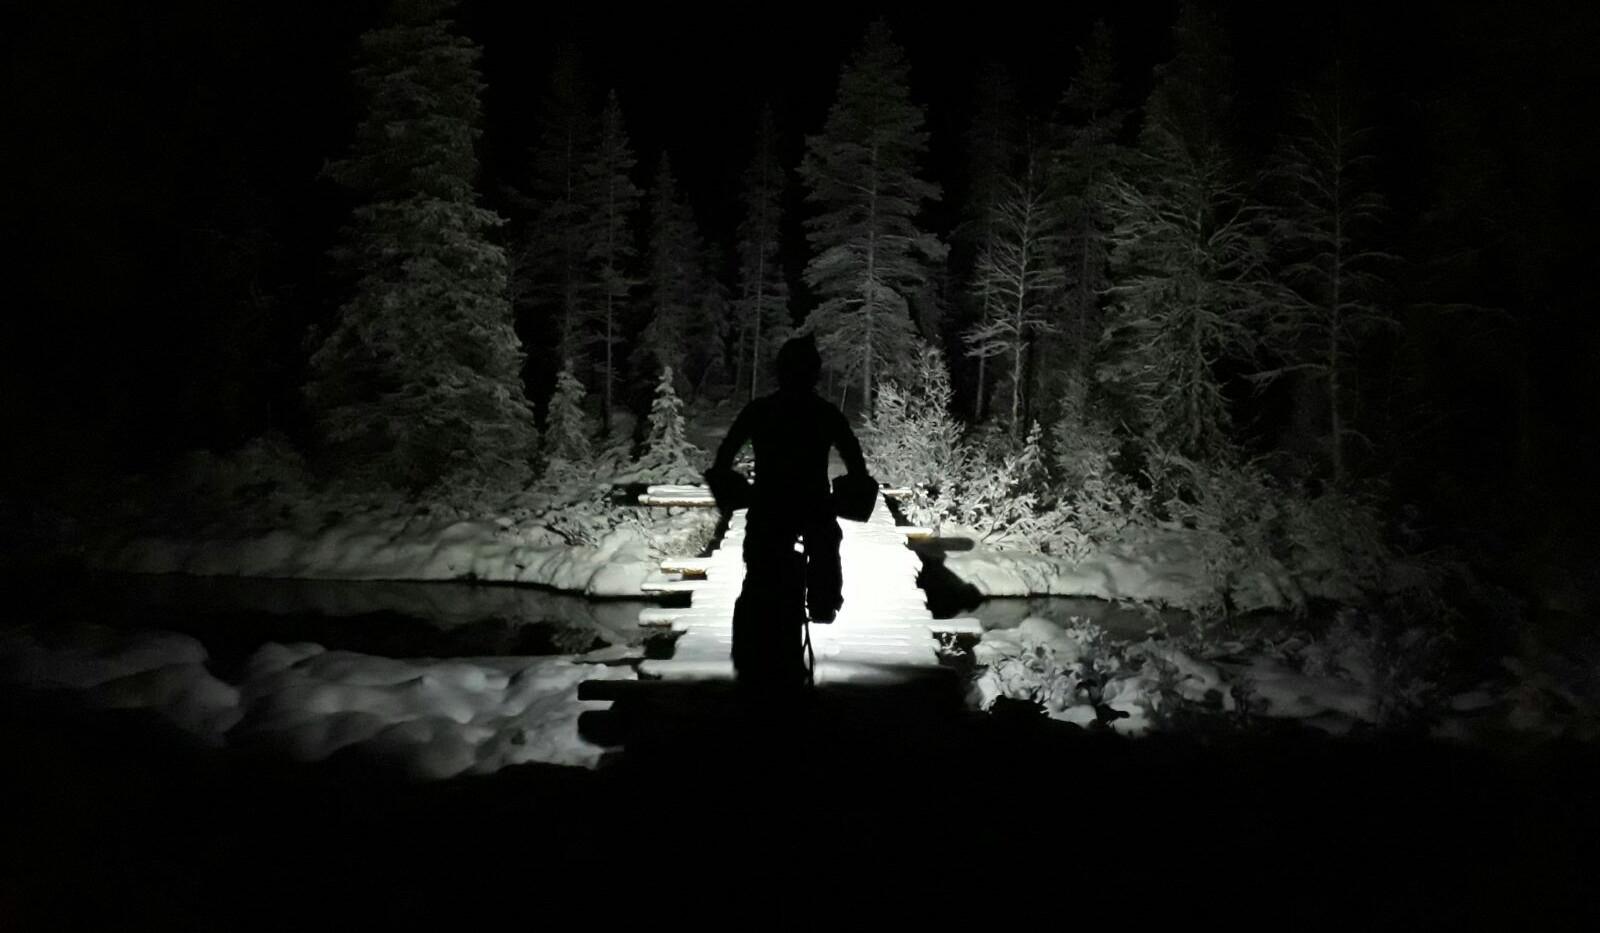 Bike light showing the way